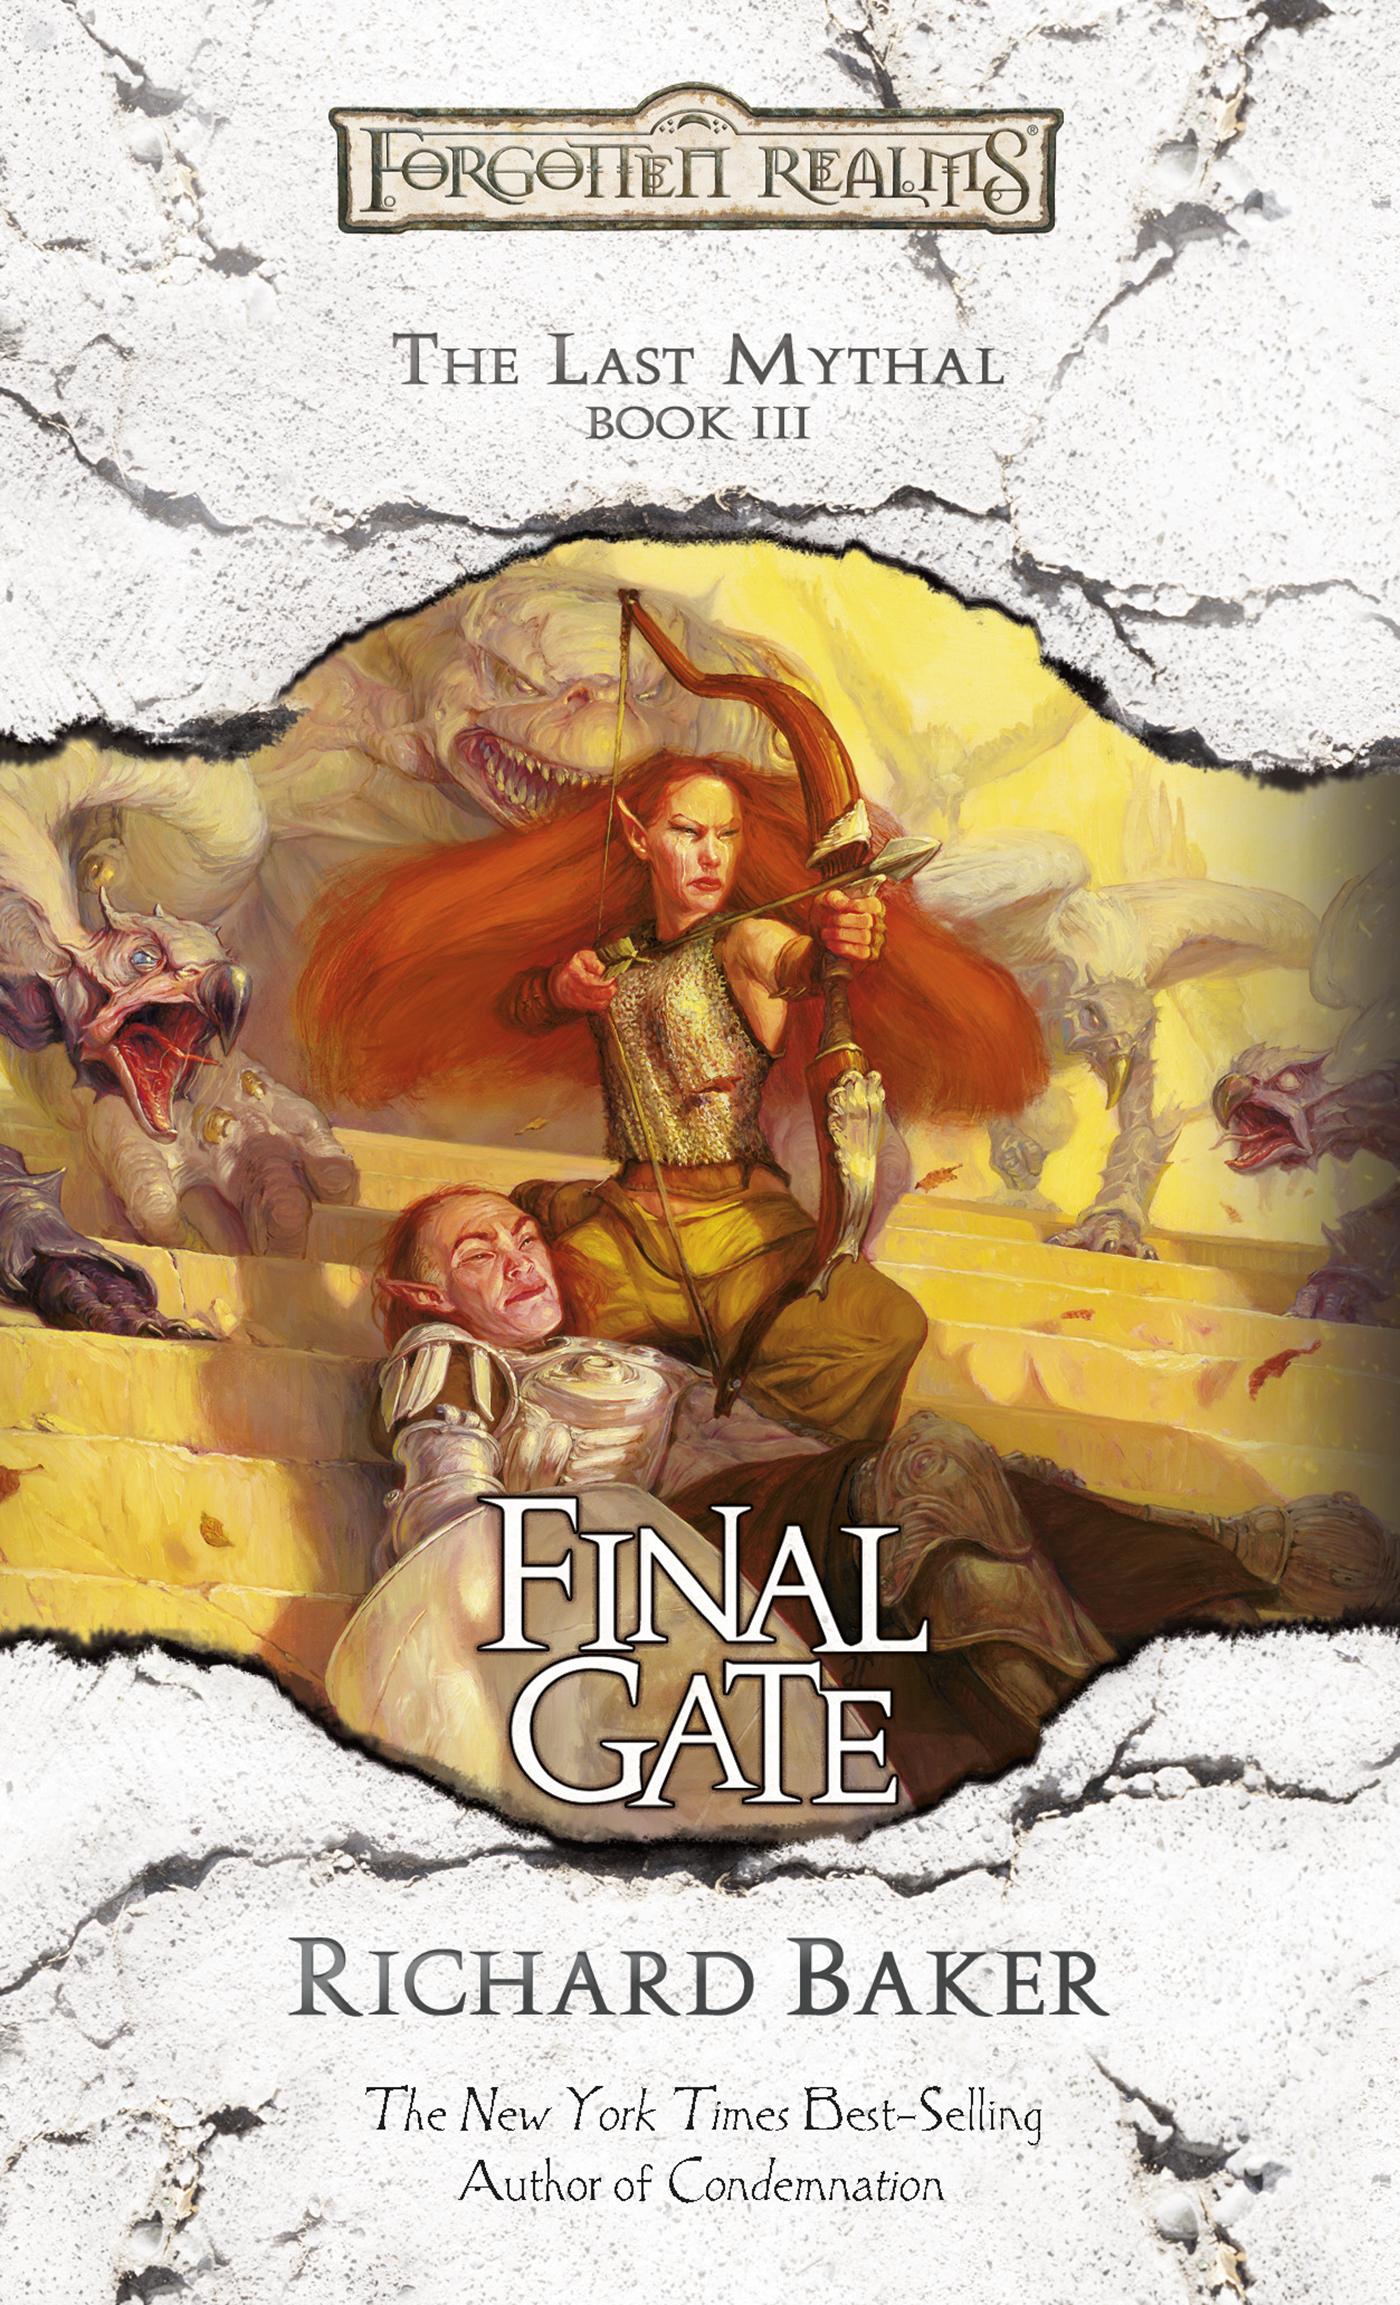 Final Gate